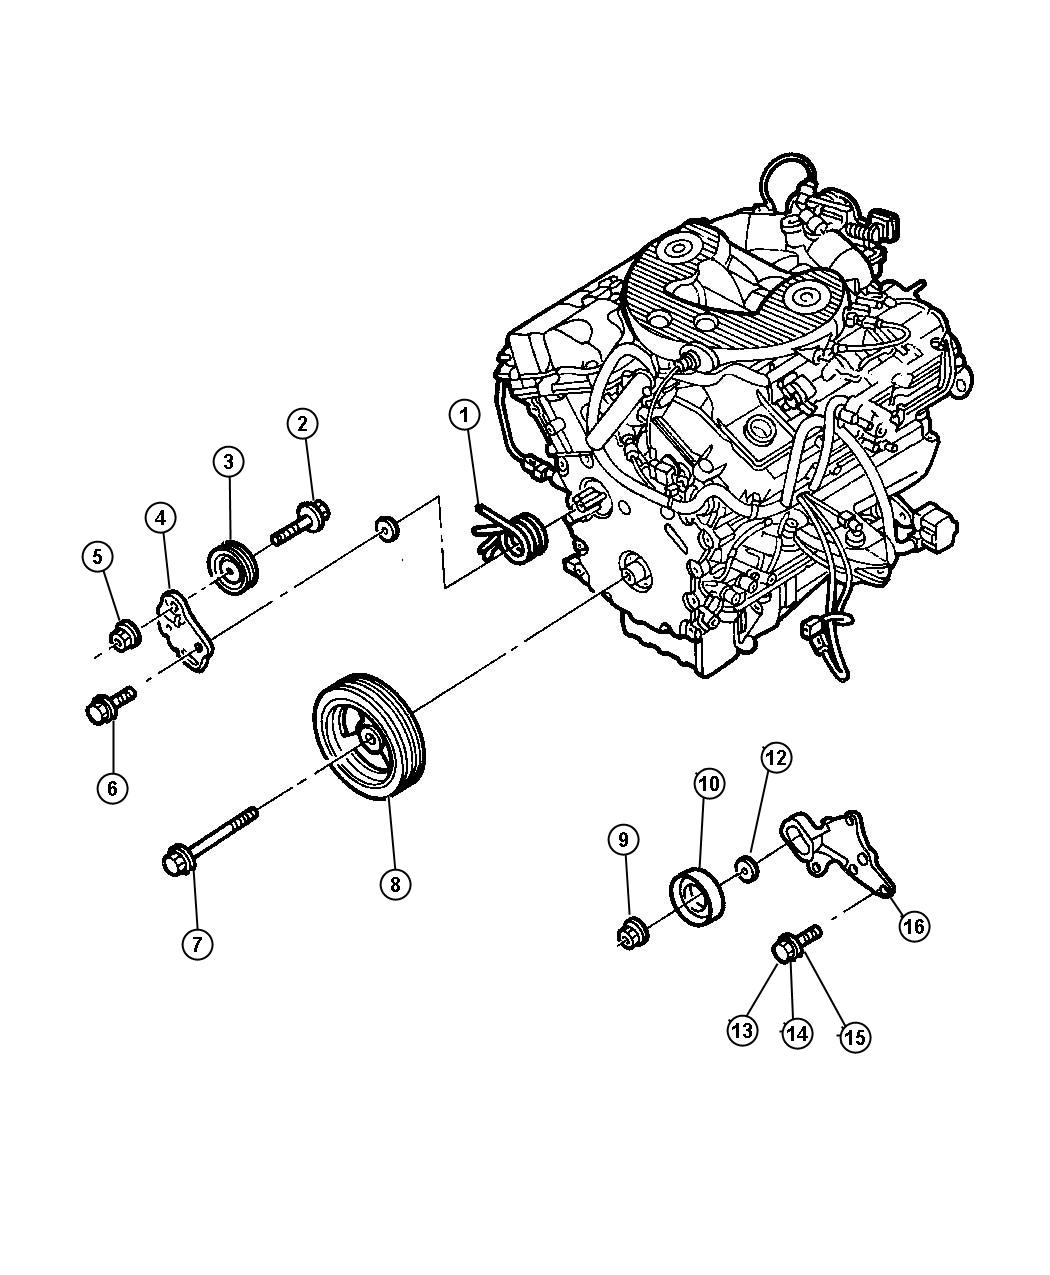 Likewise 1999 Chrysler 300m Engine Diagram Further 2001 Chrysler 300m